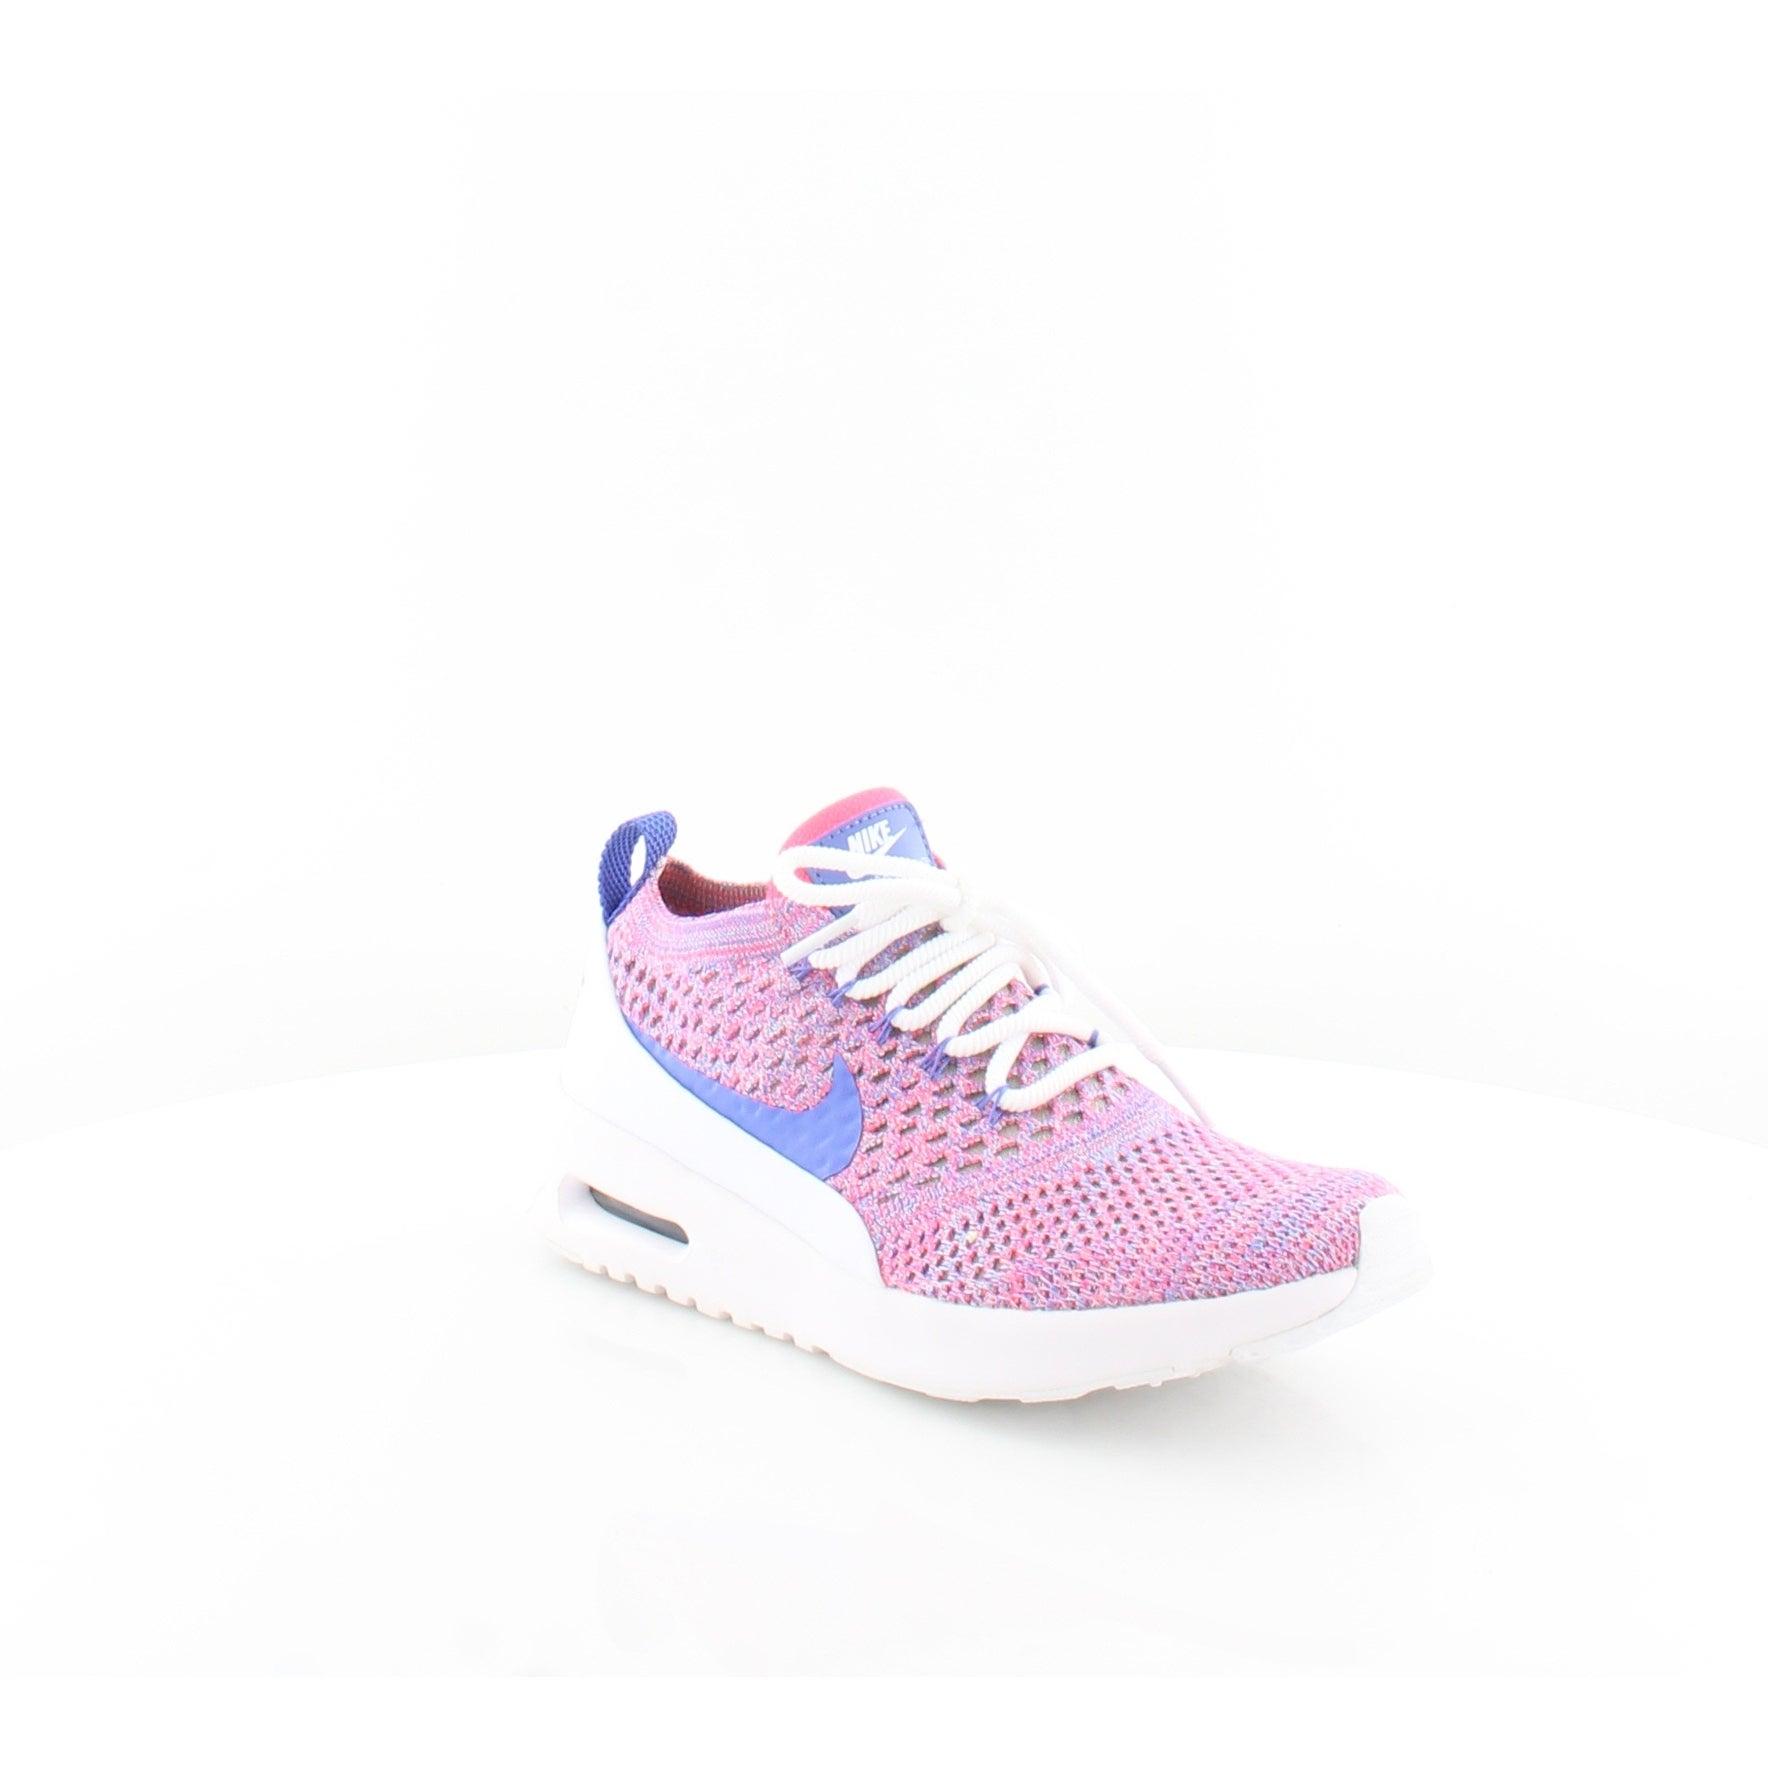 pretty nice 2809e b3e4f Nike Air Max Thea Women s Athletic White Medium Blue  Racer Pink - 6.5